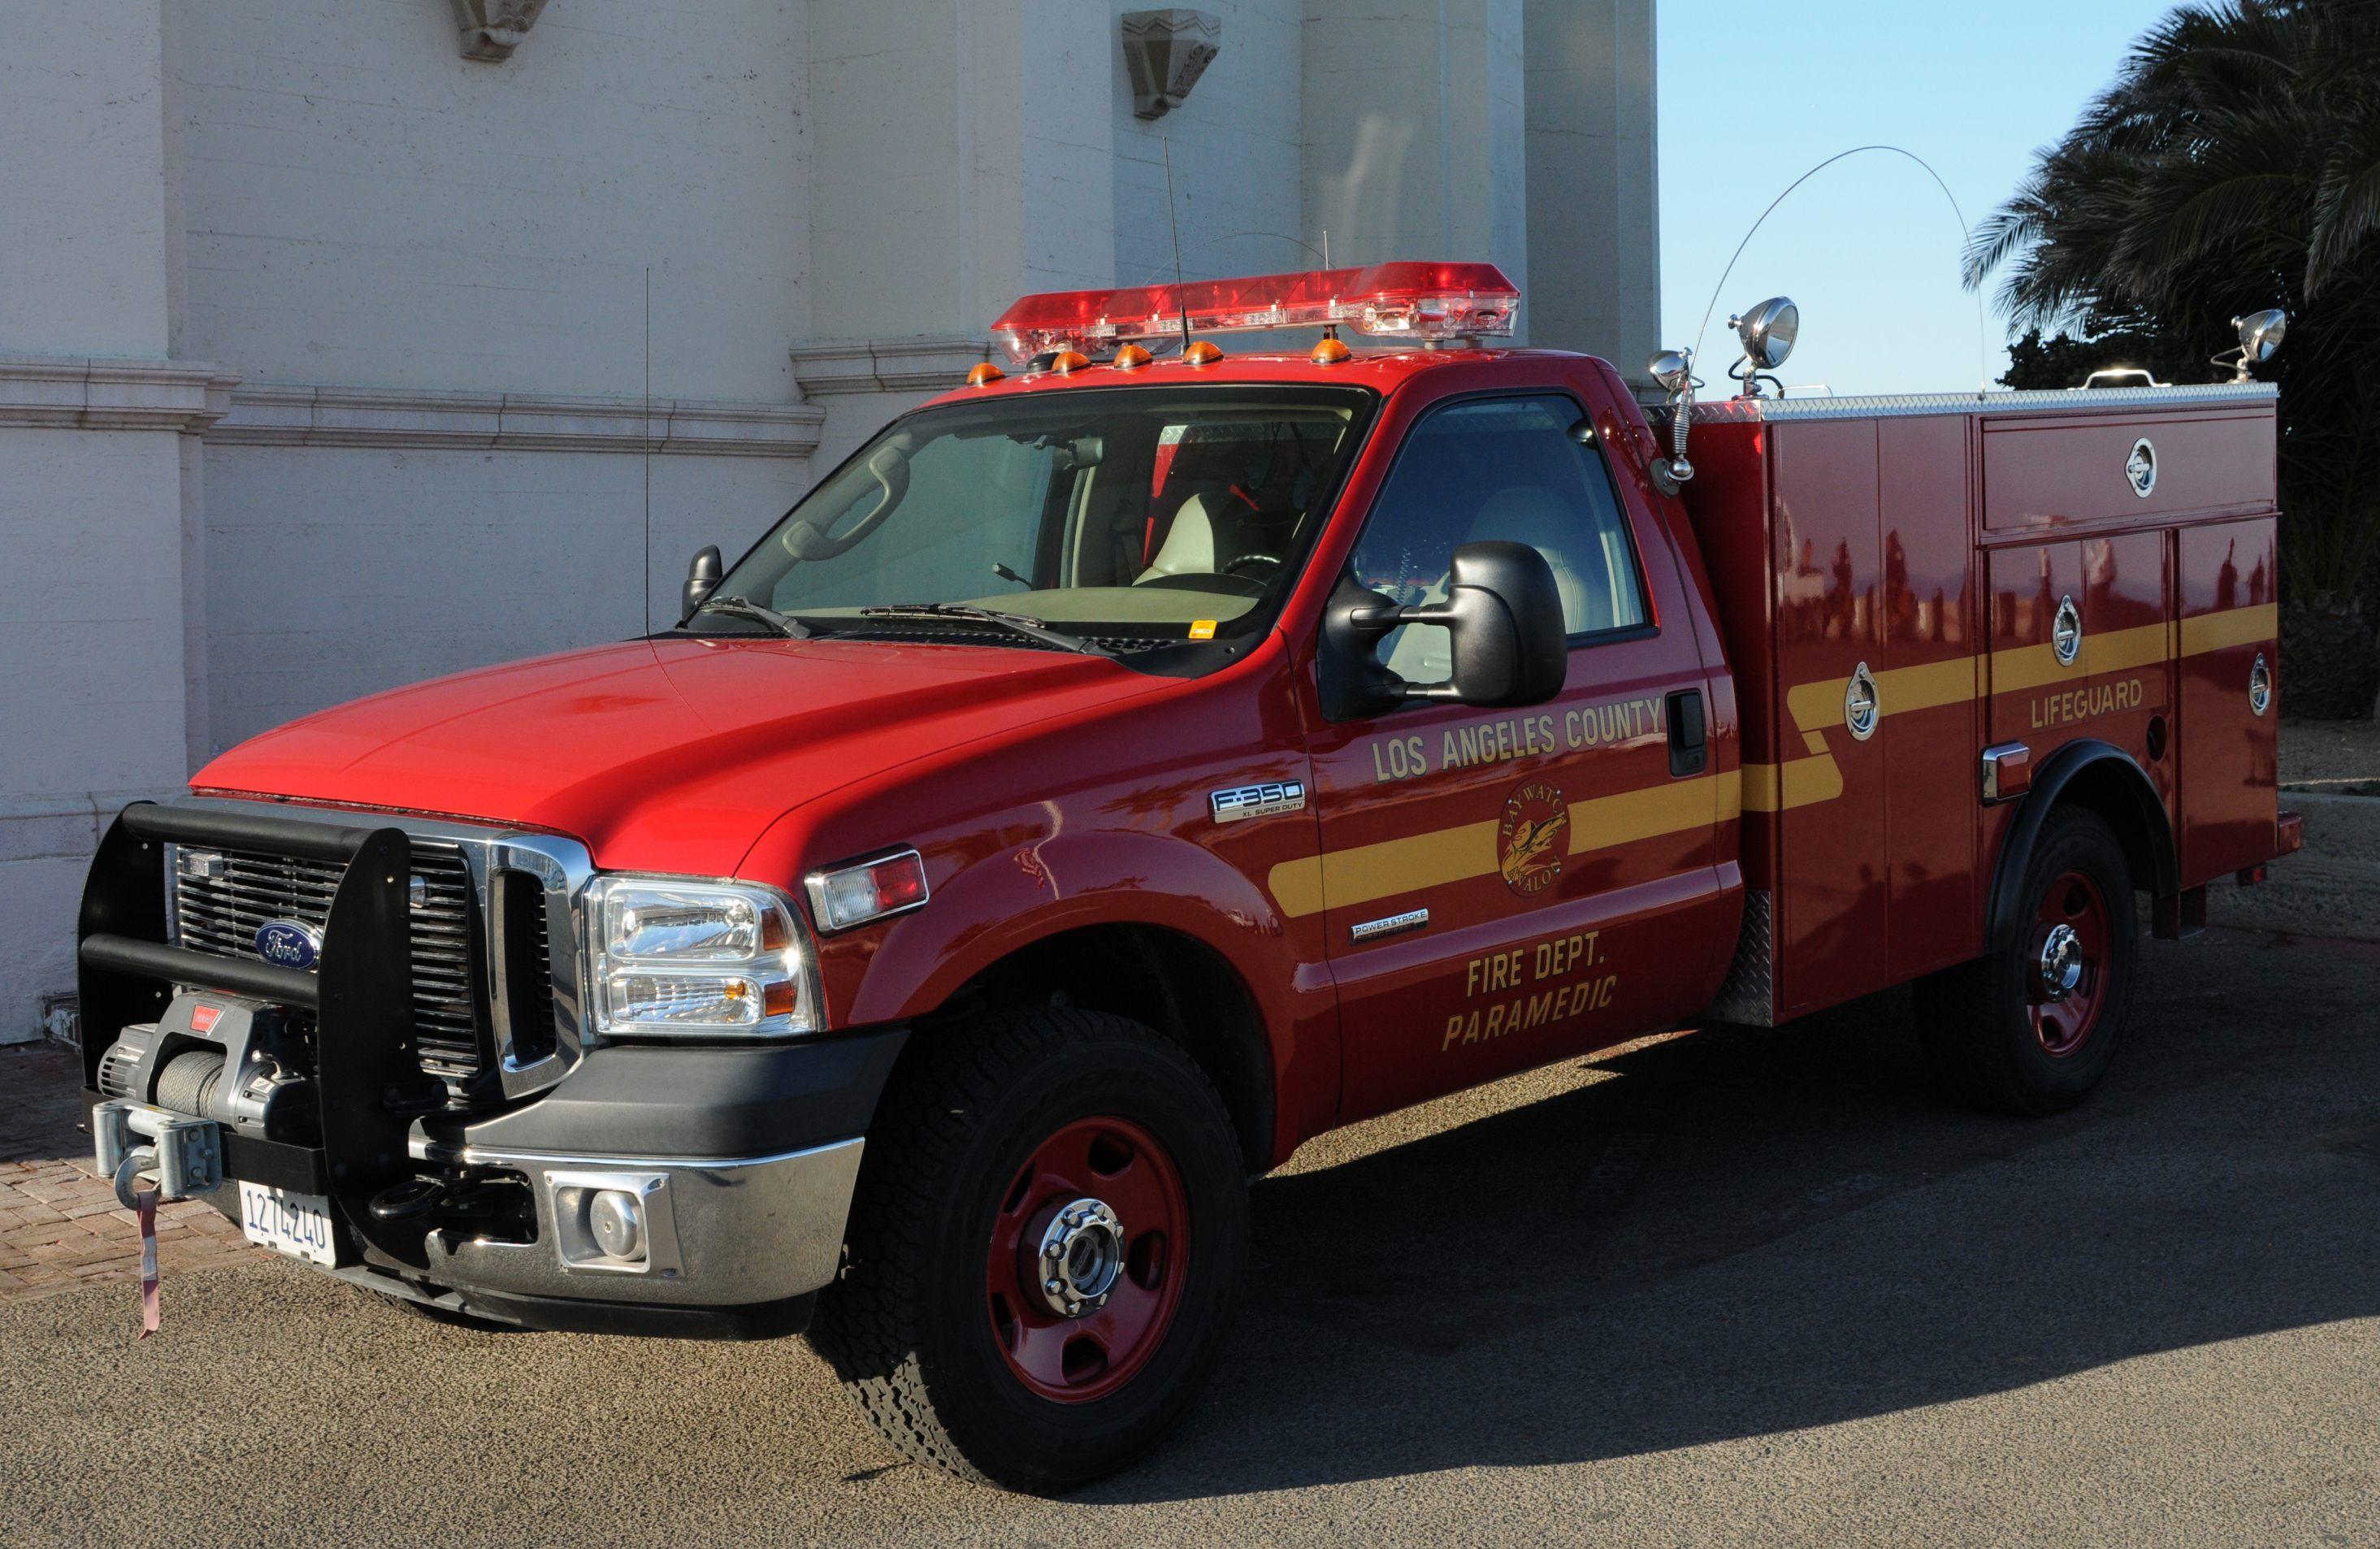 Ems vehicles rescue trucks trucks emergency vehicles